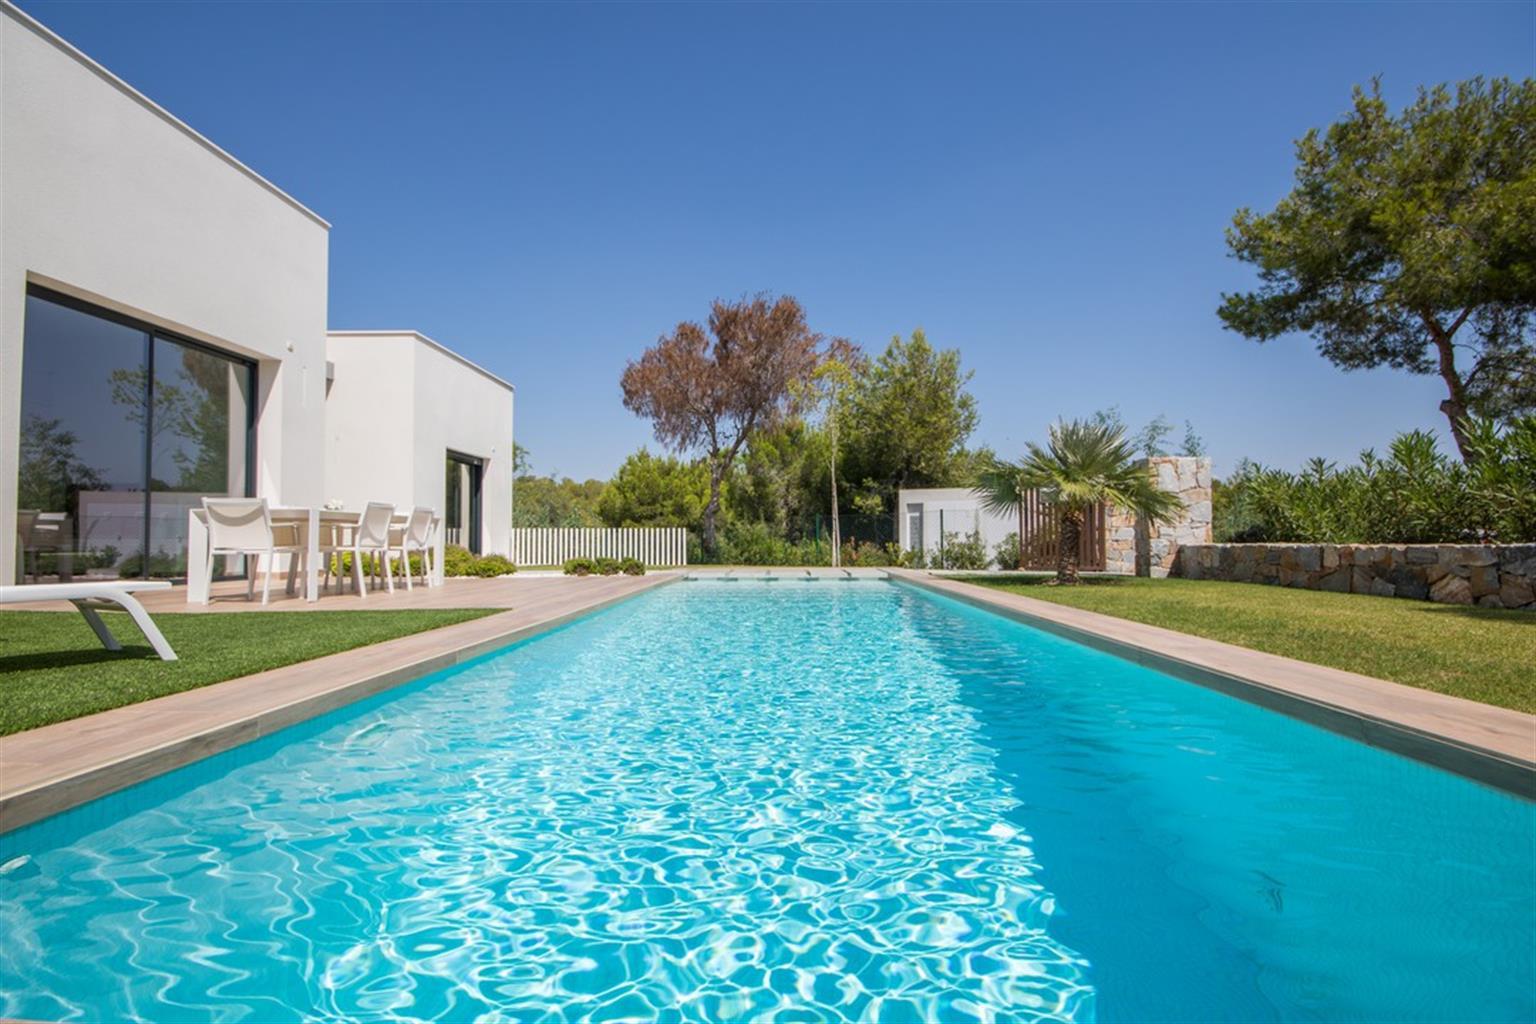 Maison - Villamartin - #4228155-29